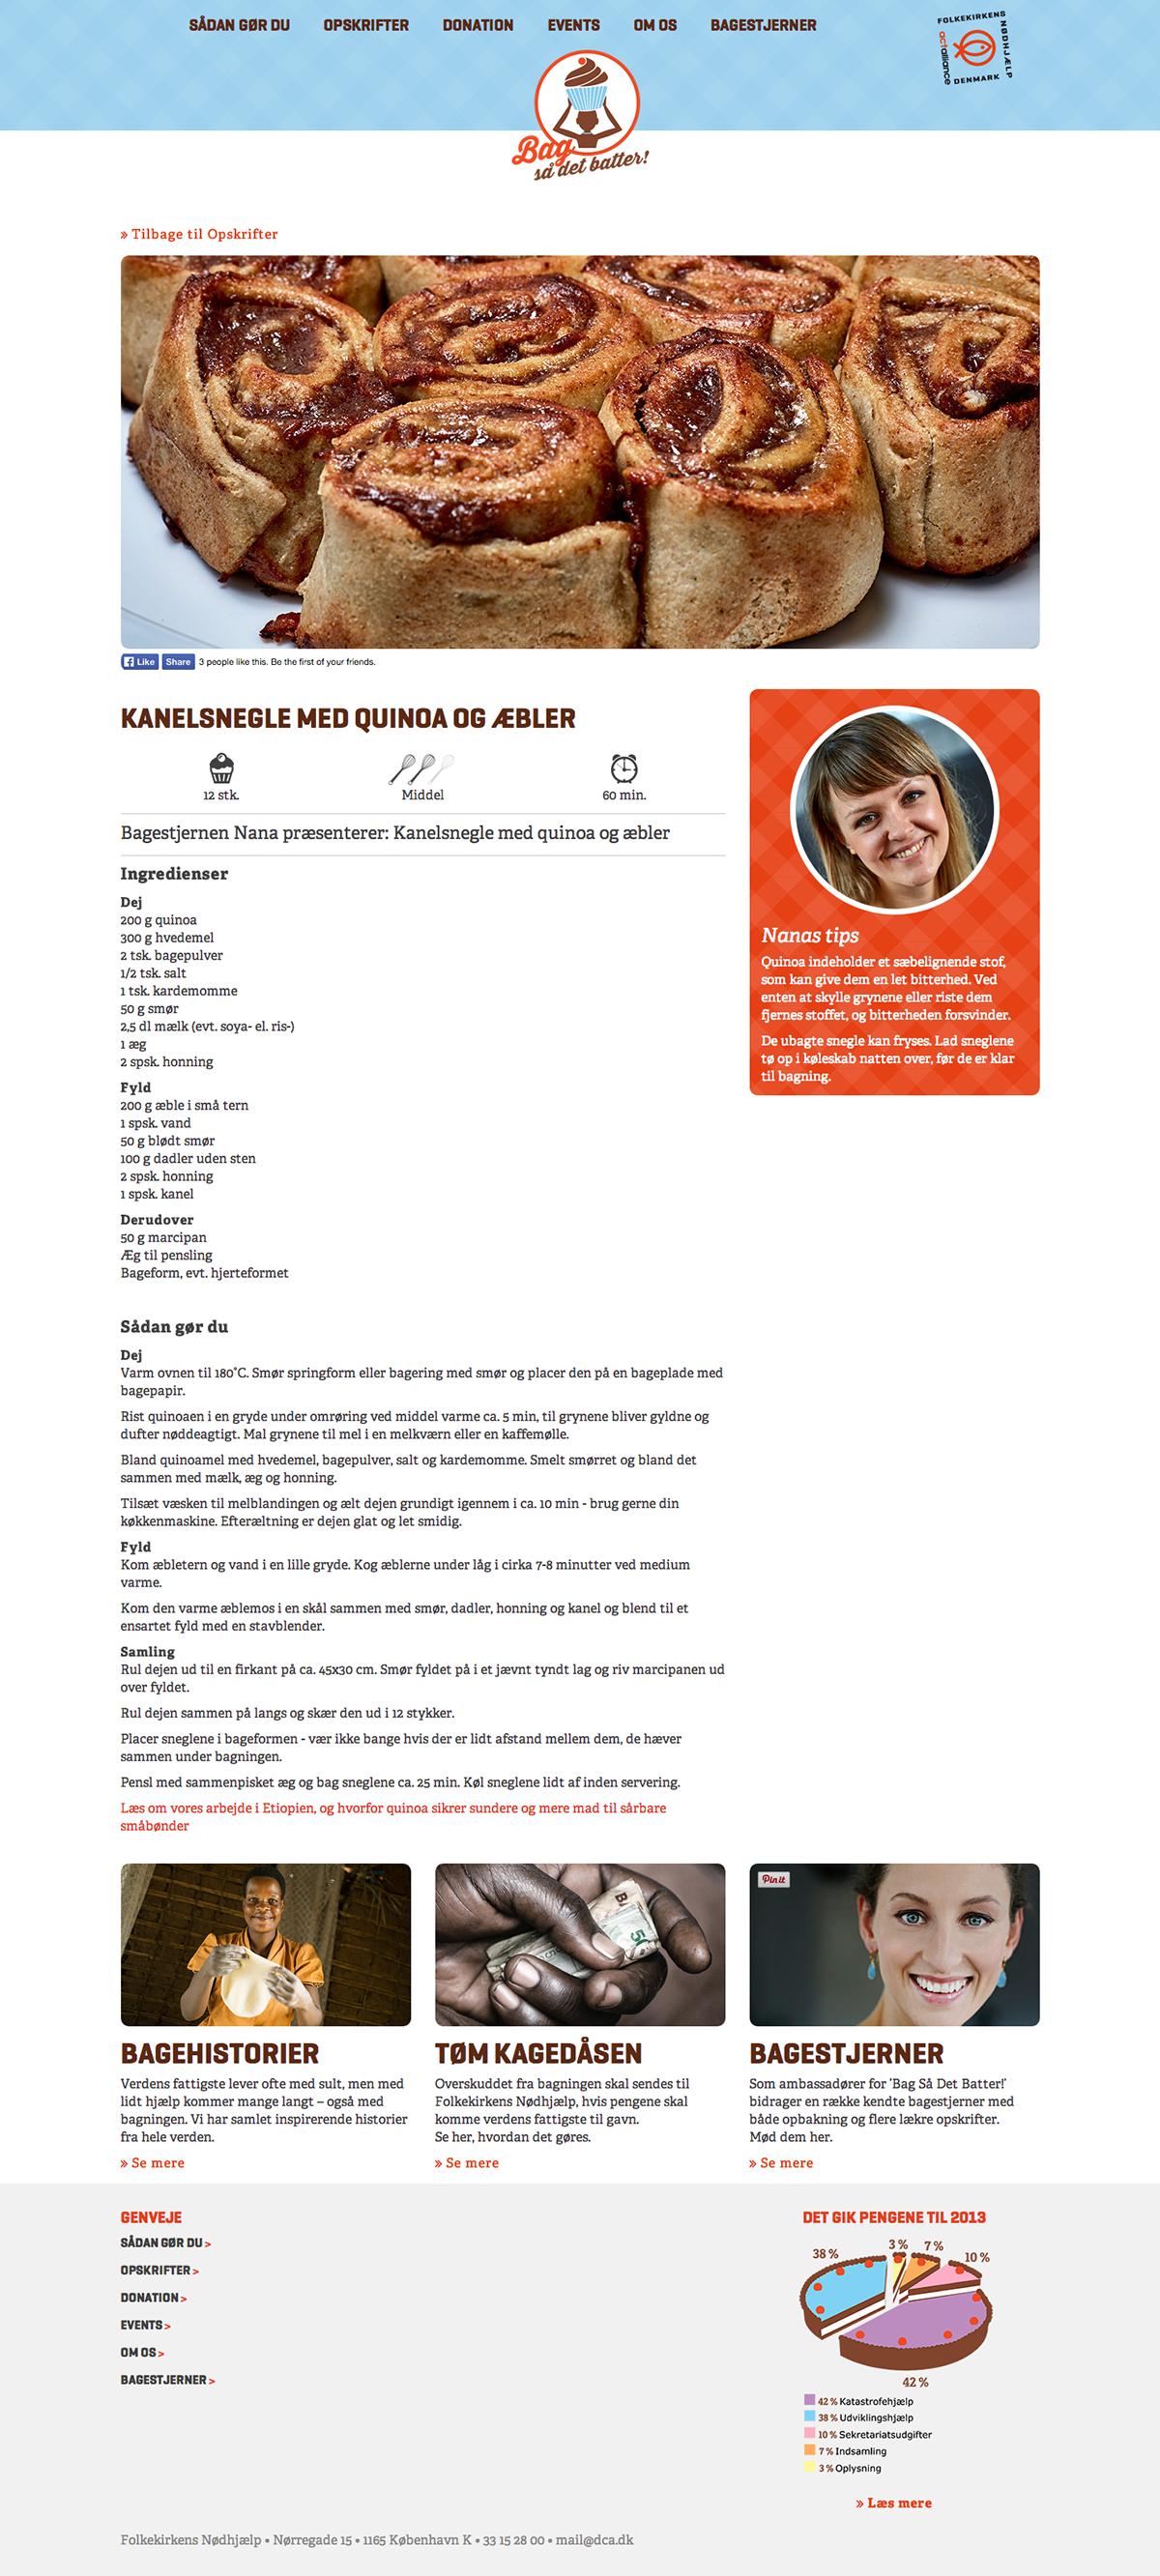 Website NGO baking charity donate